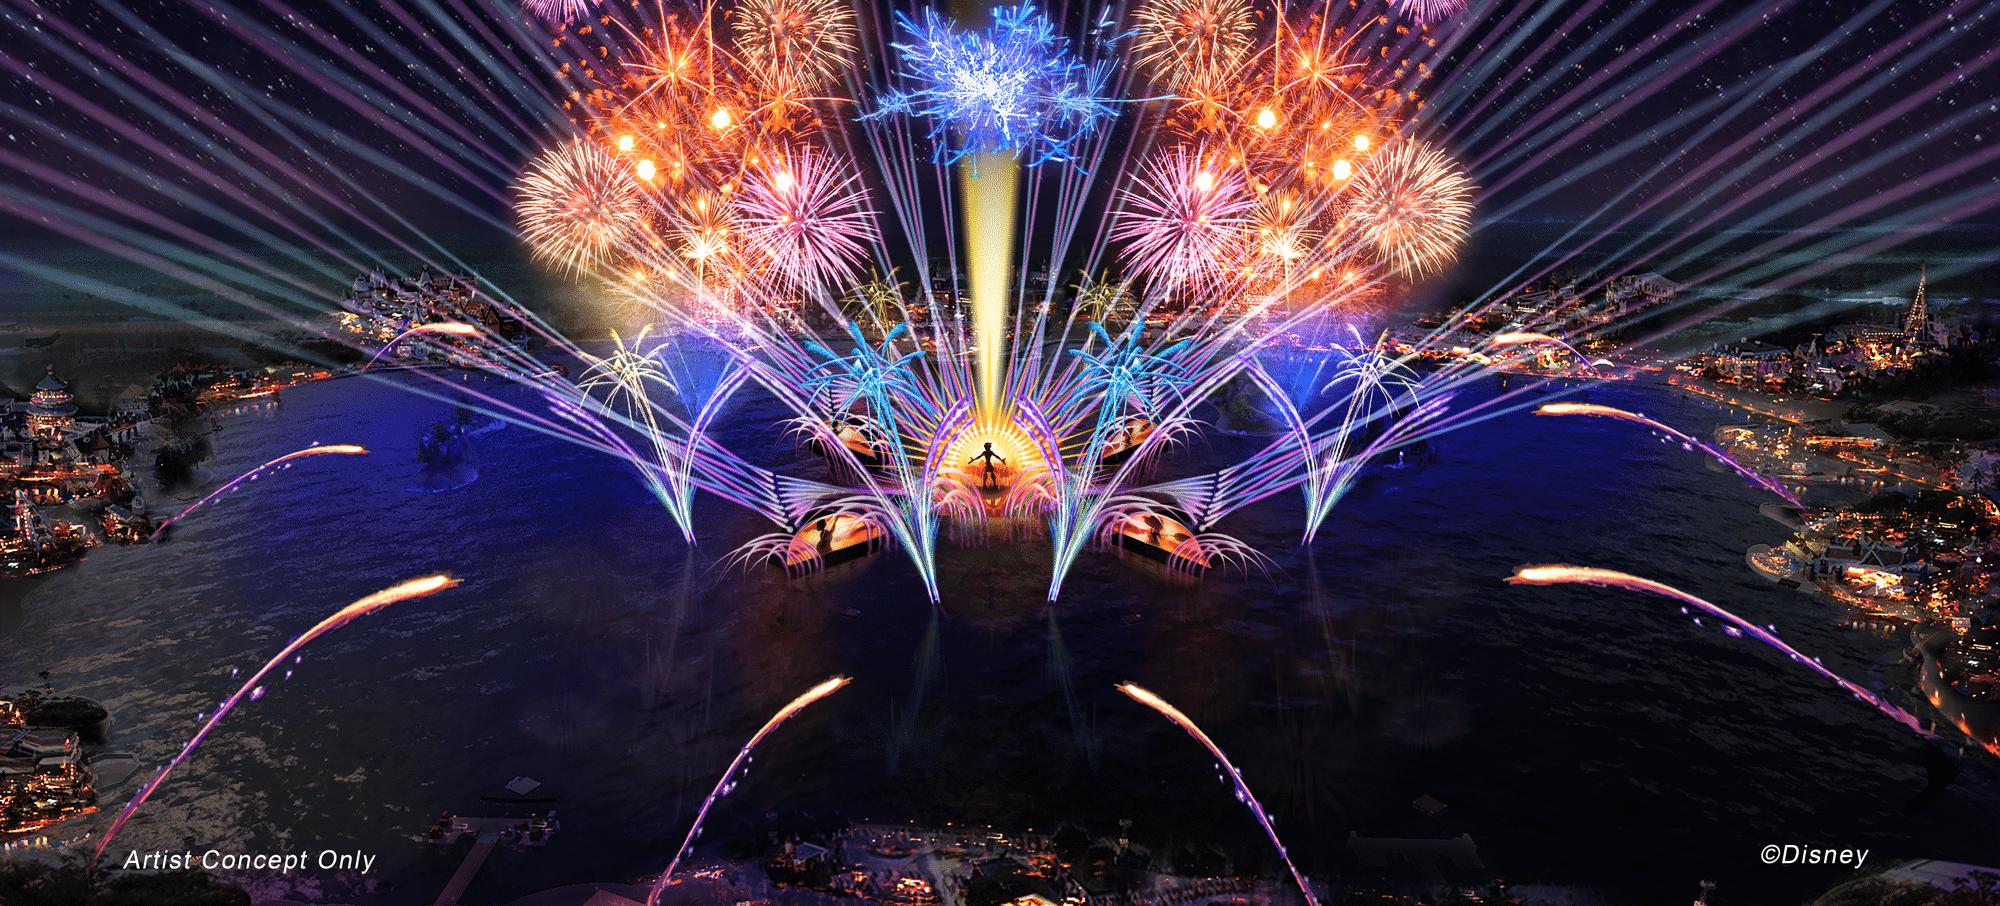 Walt Disney World Harmonious at EPCOT